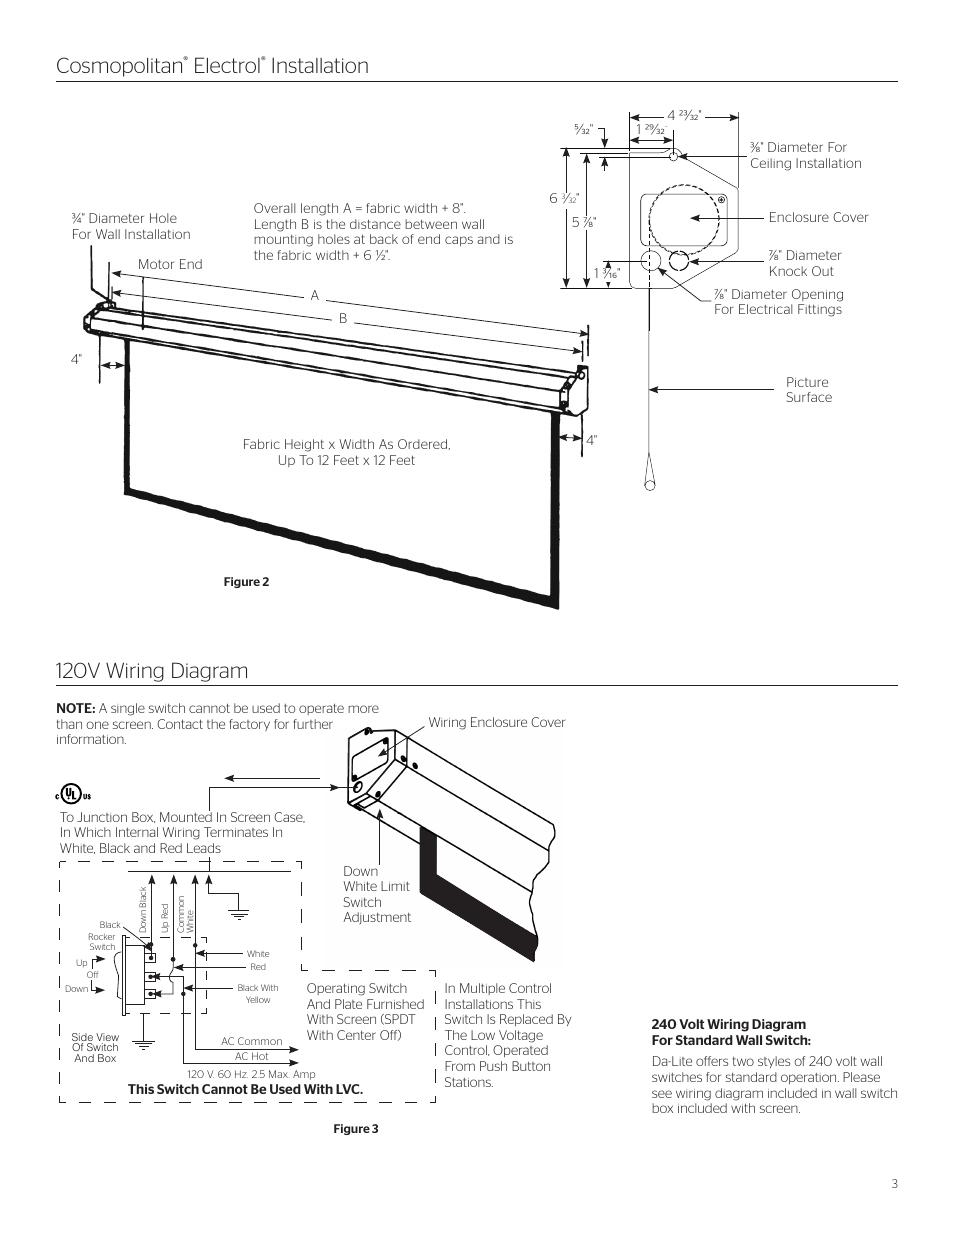 Cosmopolitan Electrol Installation 120v Wiring Diagram Da Lite